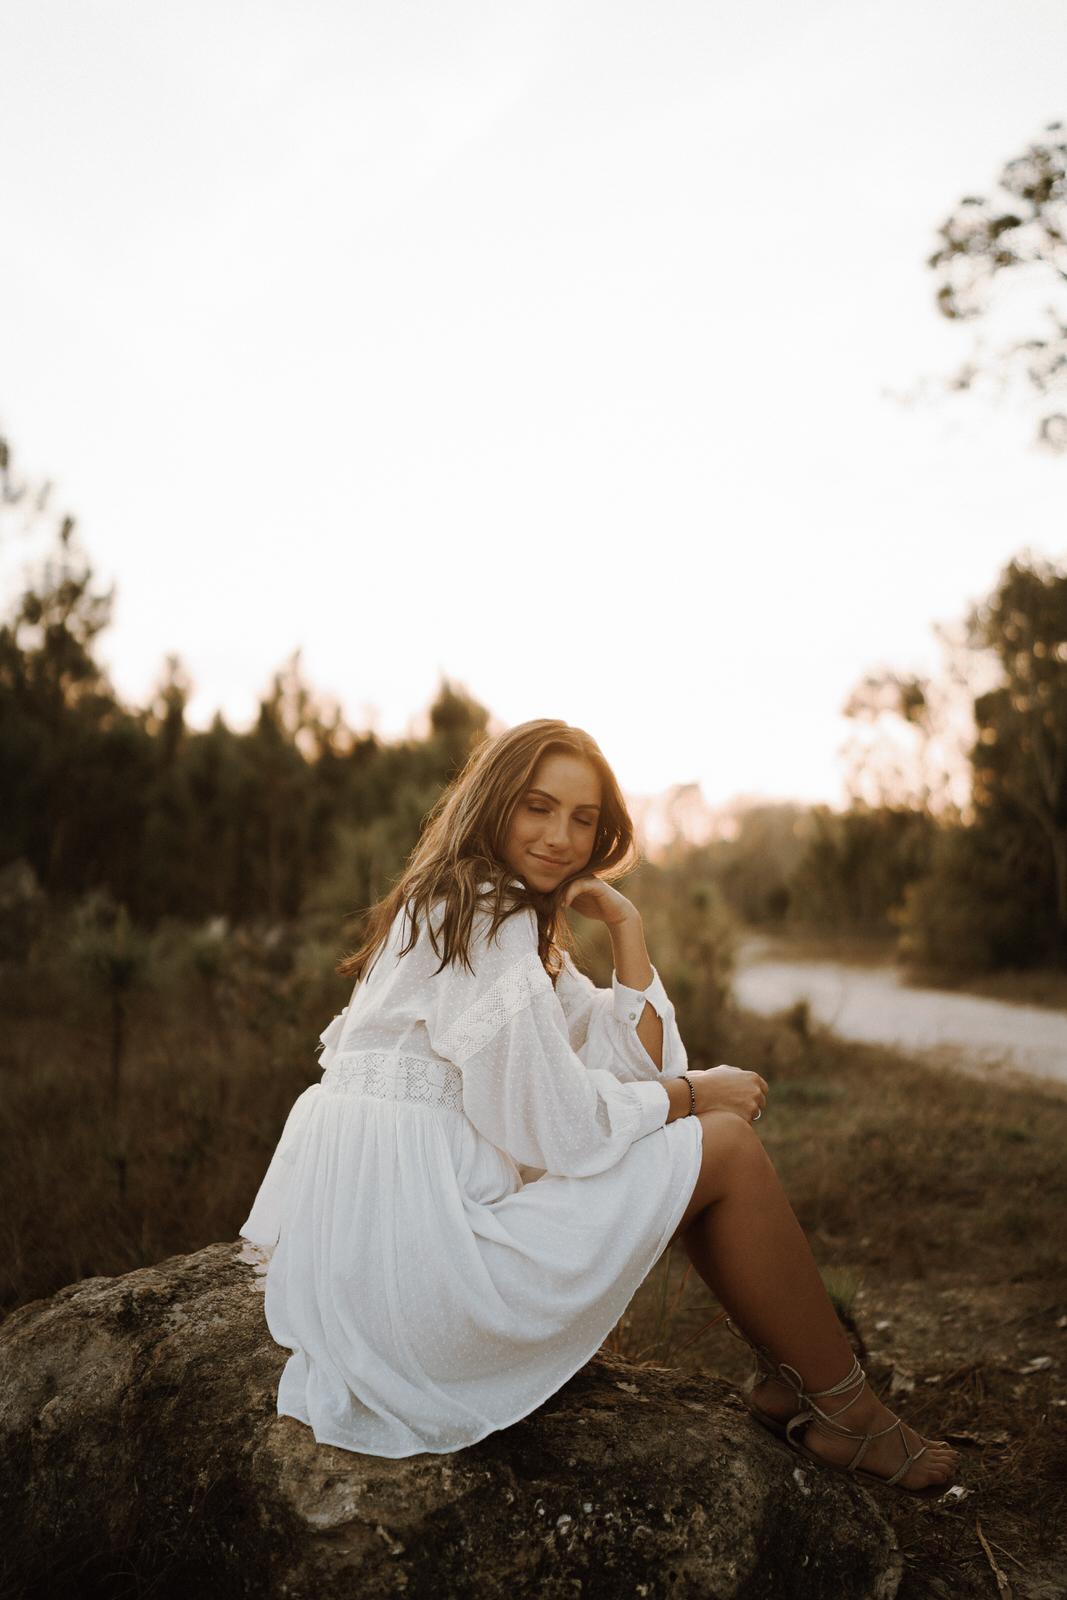 Fort Myers Senior Photos- Michelle Gonzalez Photography- Kate McQuagge-164.JPG